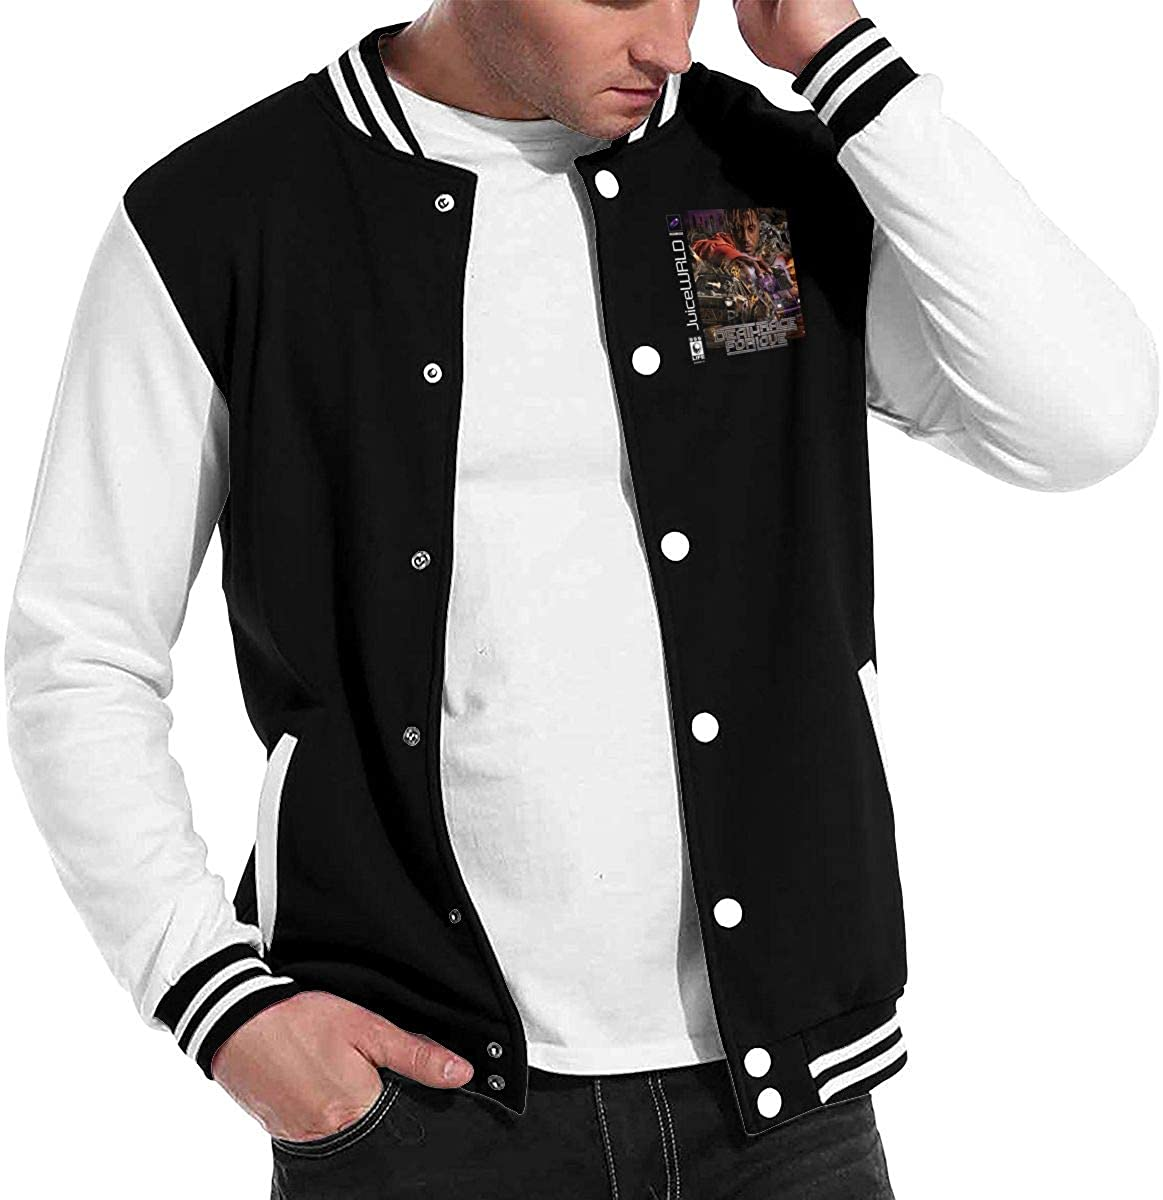 NOT Juice WRLD Mens Fashion Sweatshirt Comfortable Baseball Uniform Black